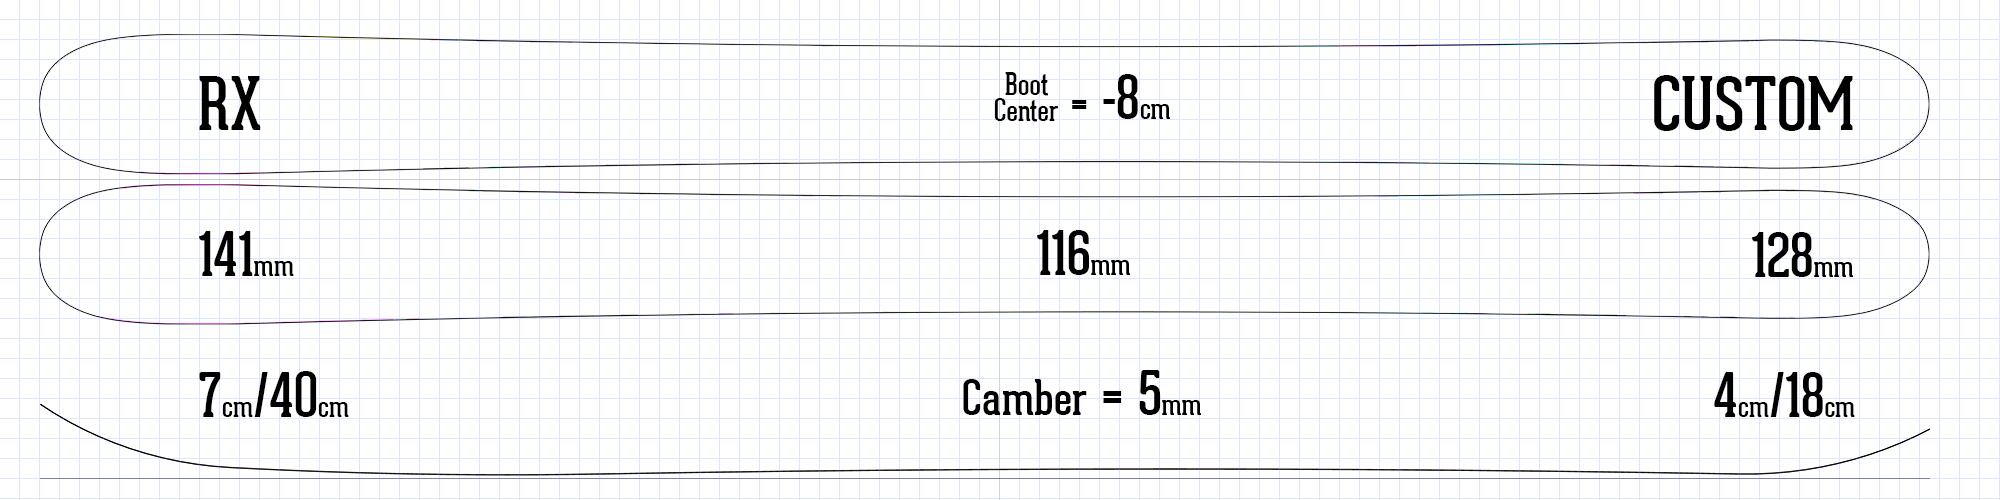 RX ski information camber rocker specs profile